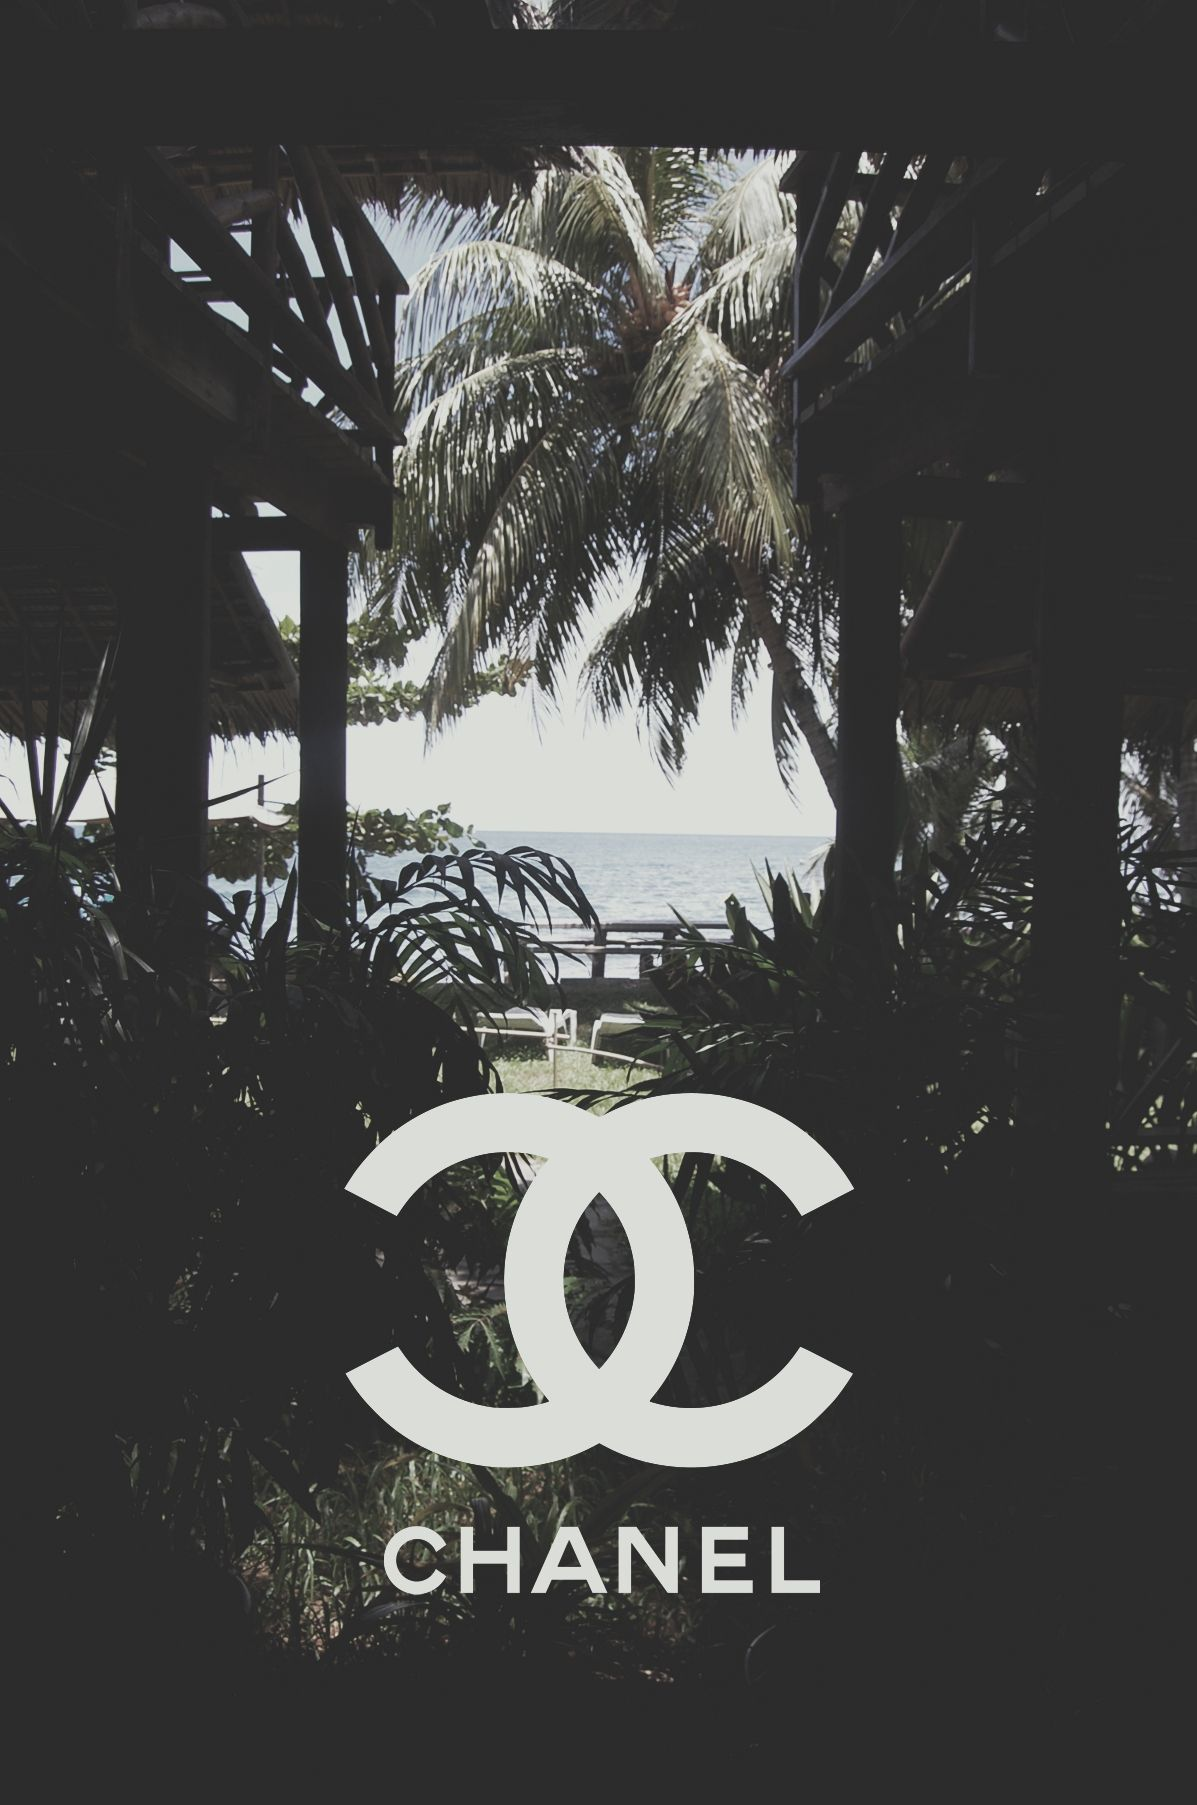 Kershaw Jagaciak Chanel Wallpapers Hipster Wallpaper Tumblr